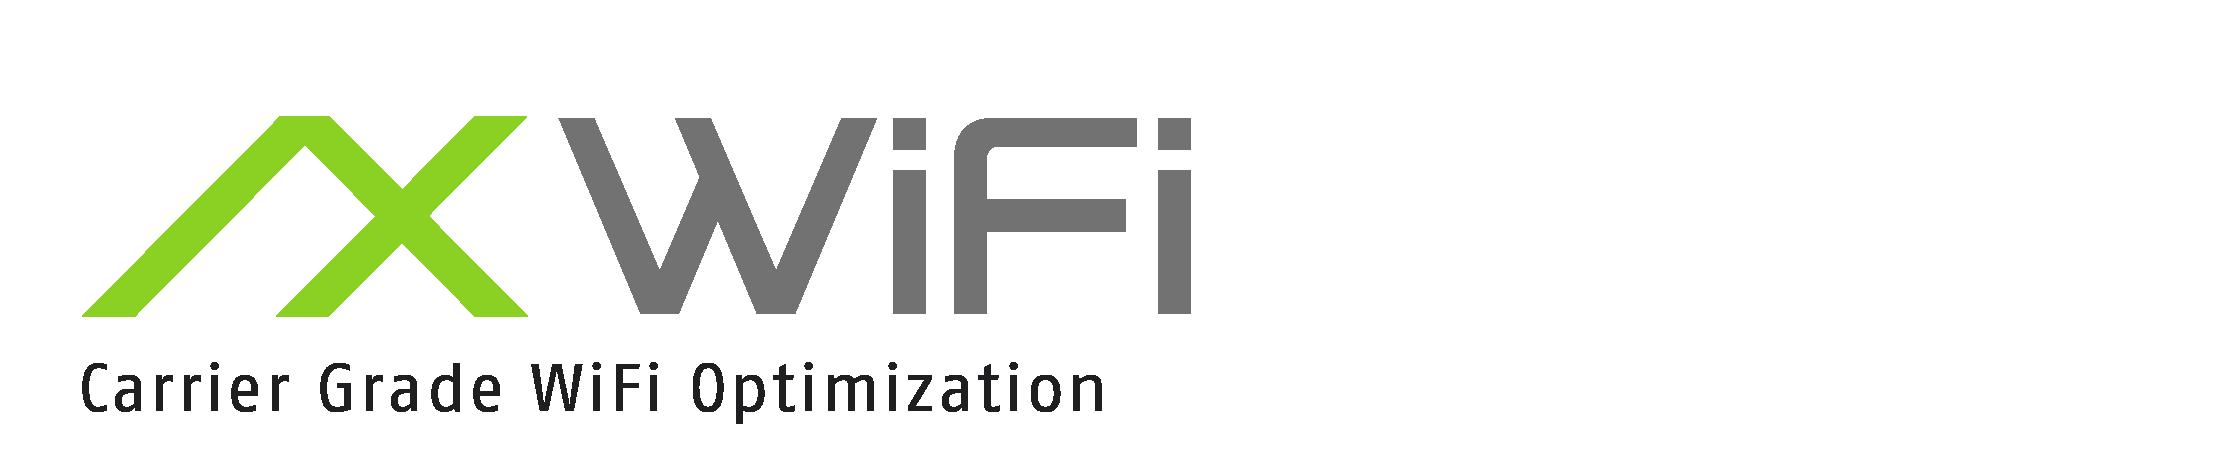 axwifi_logo.png